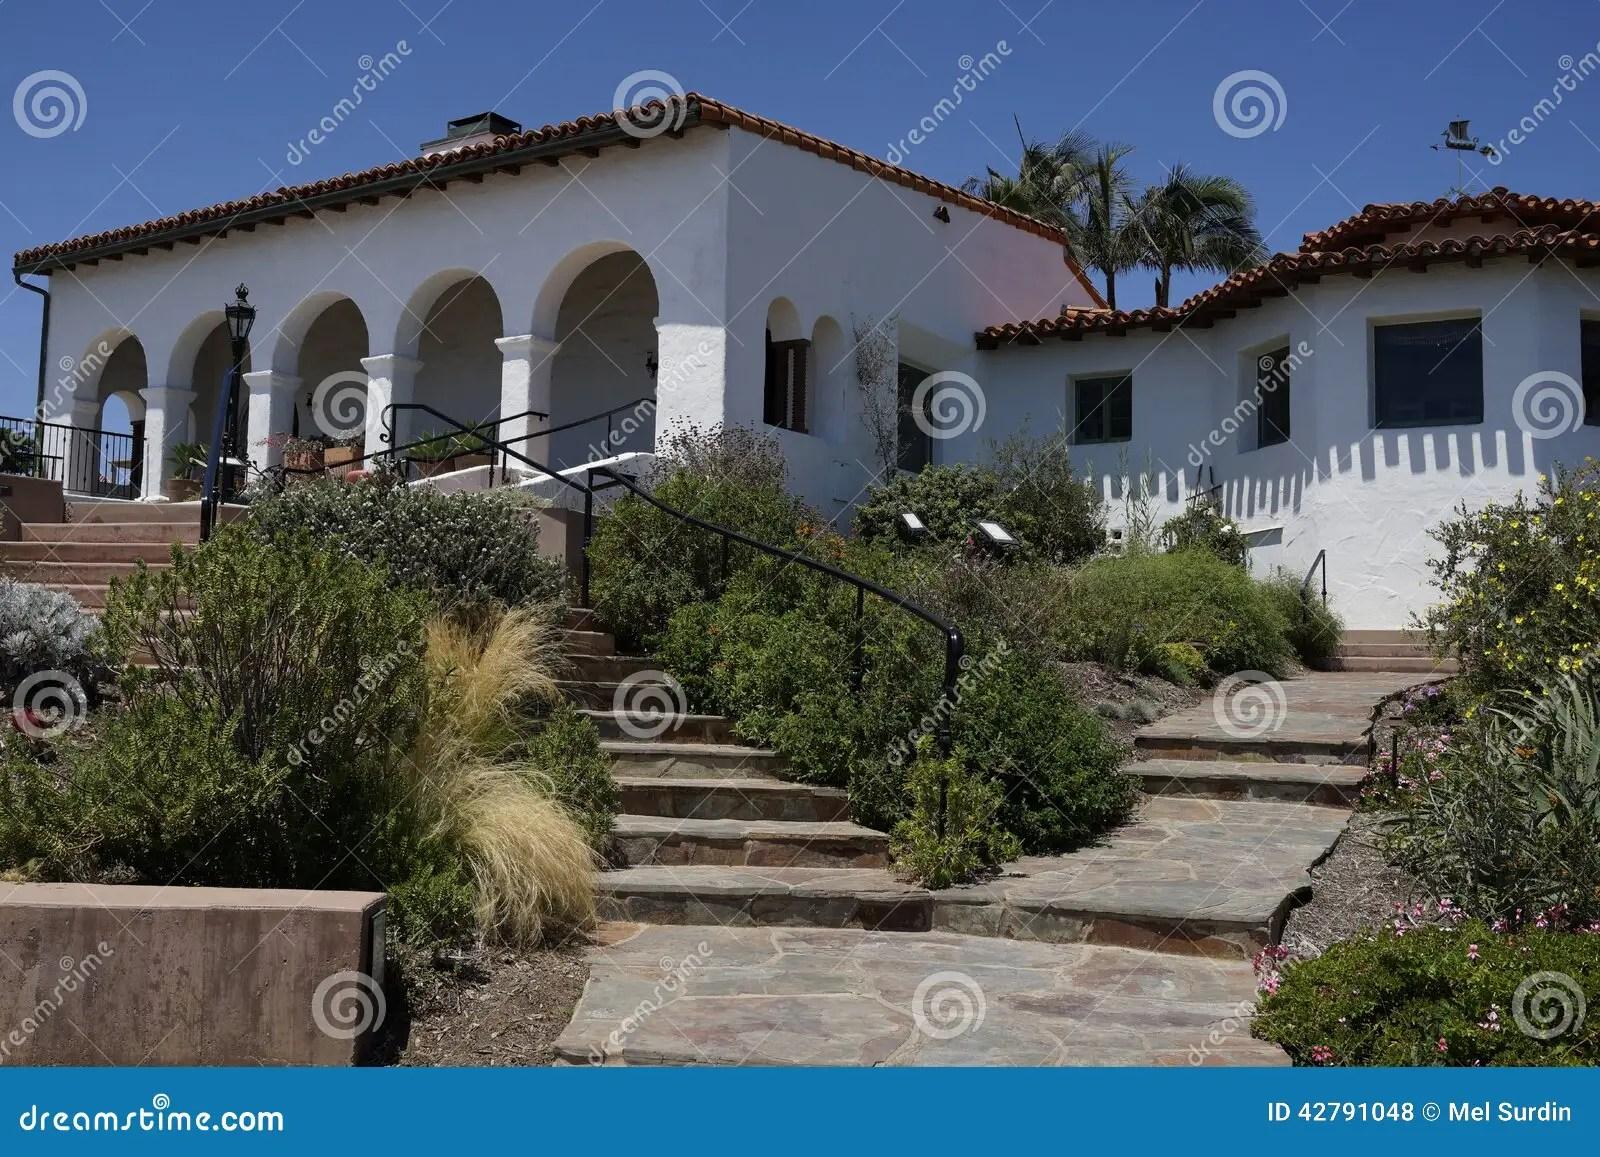 spanish bungalow style homes calabasas california luxury homes luxury spanish style hacienda marisol malibu february